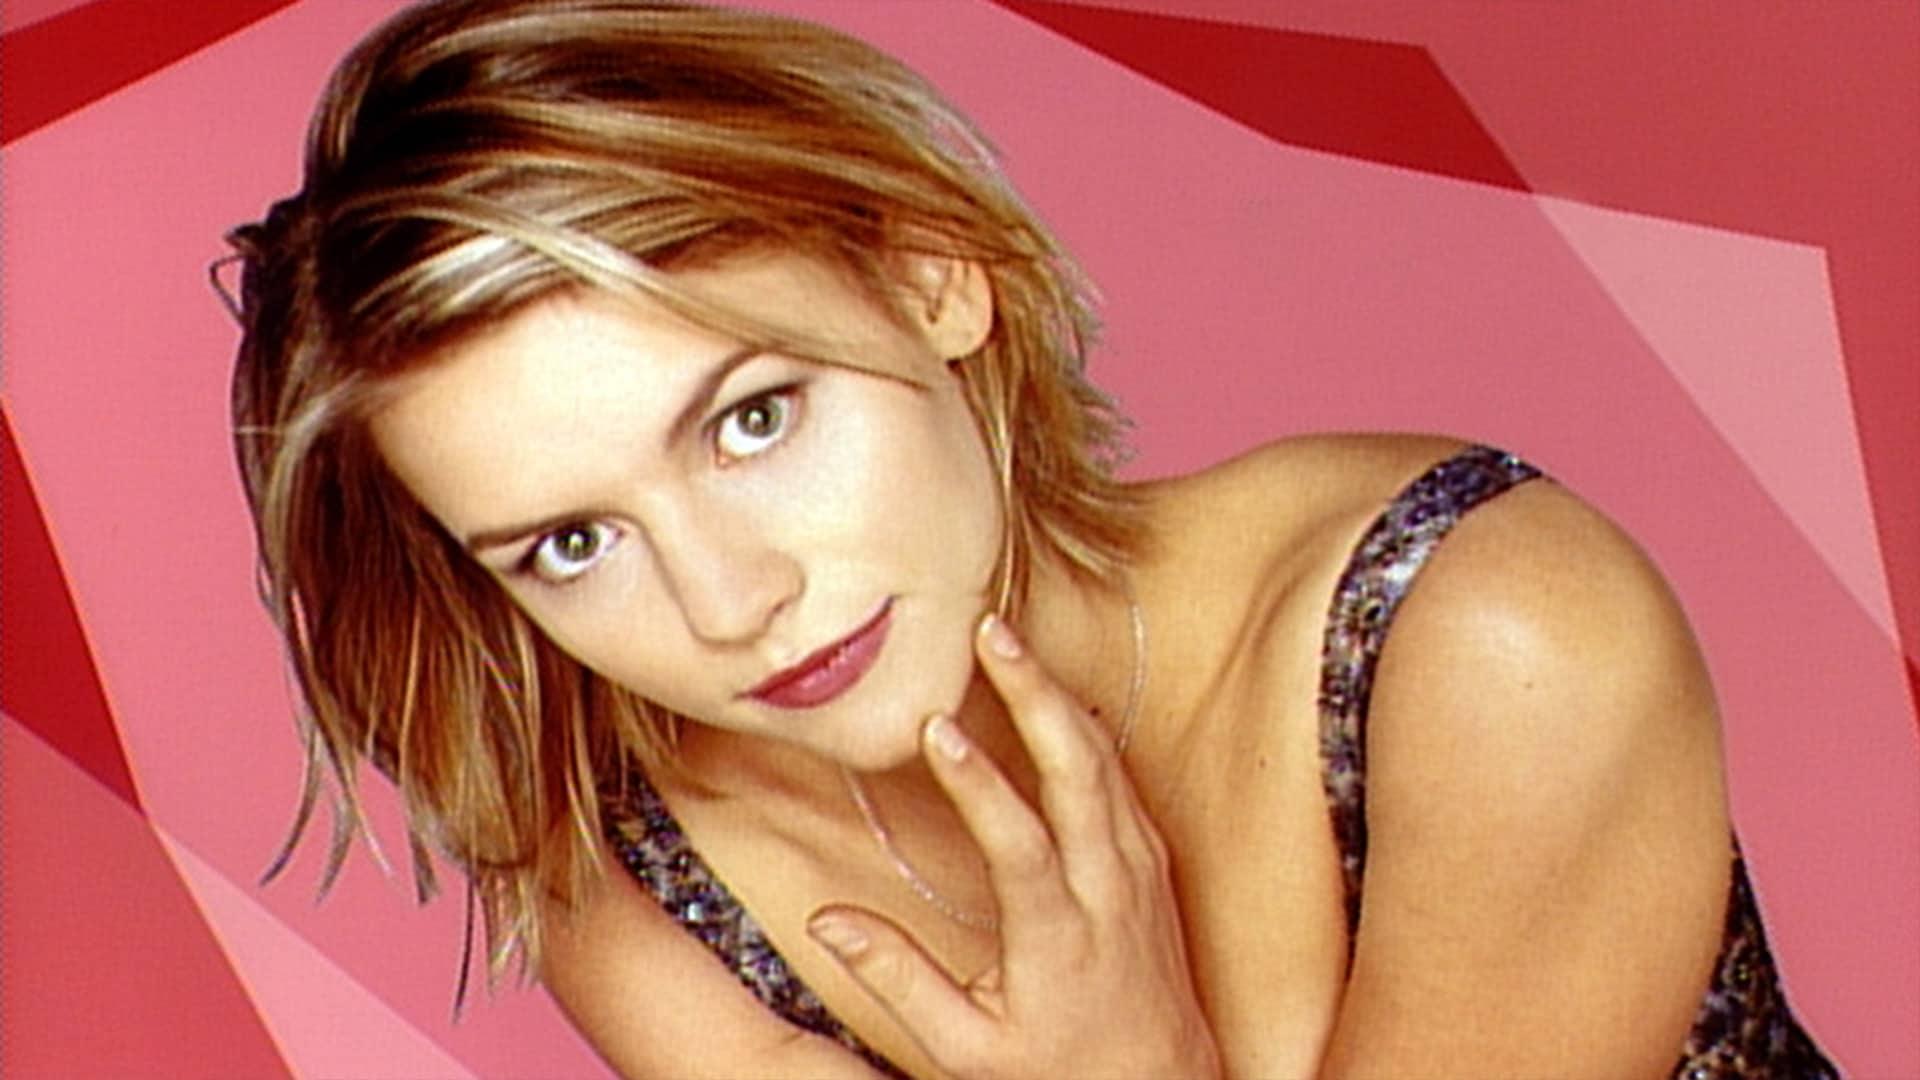 Claire Danes: November 15, 1997